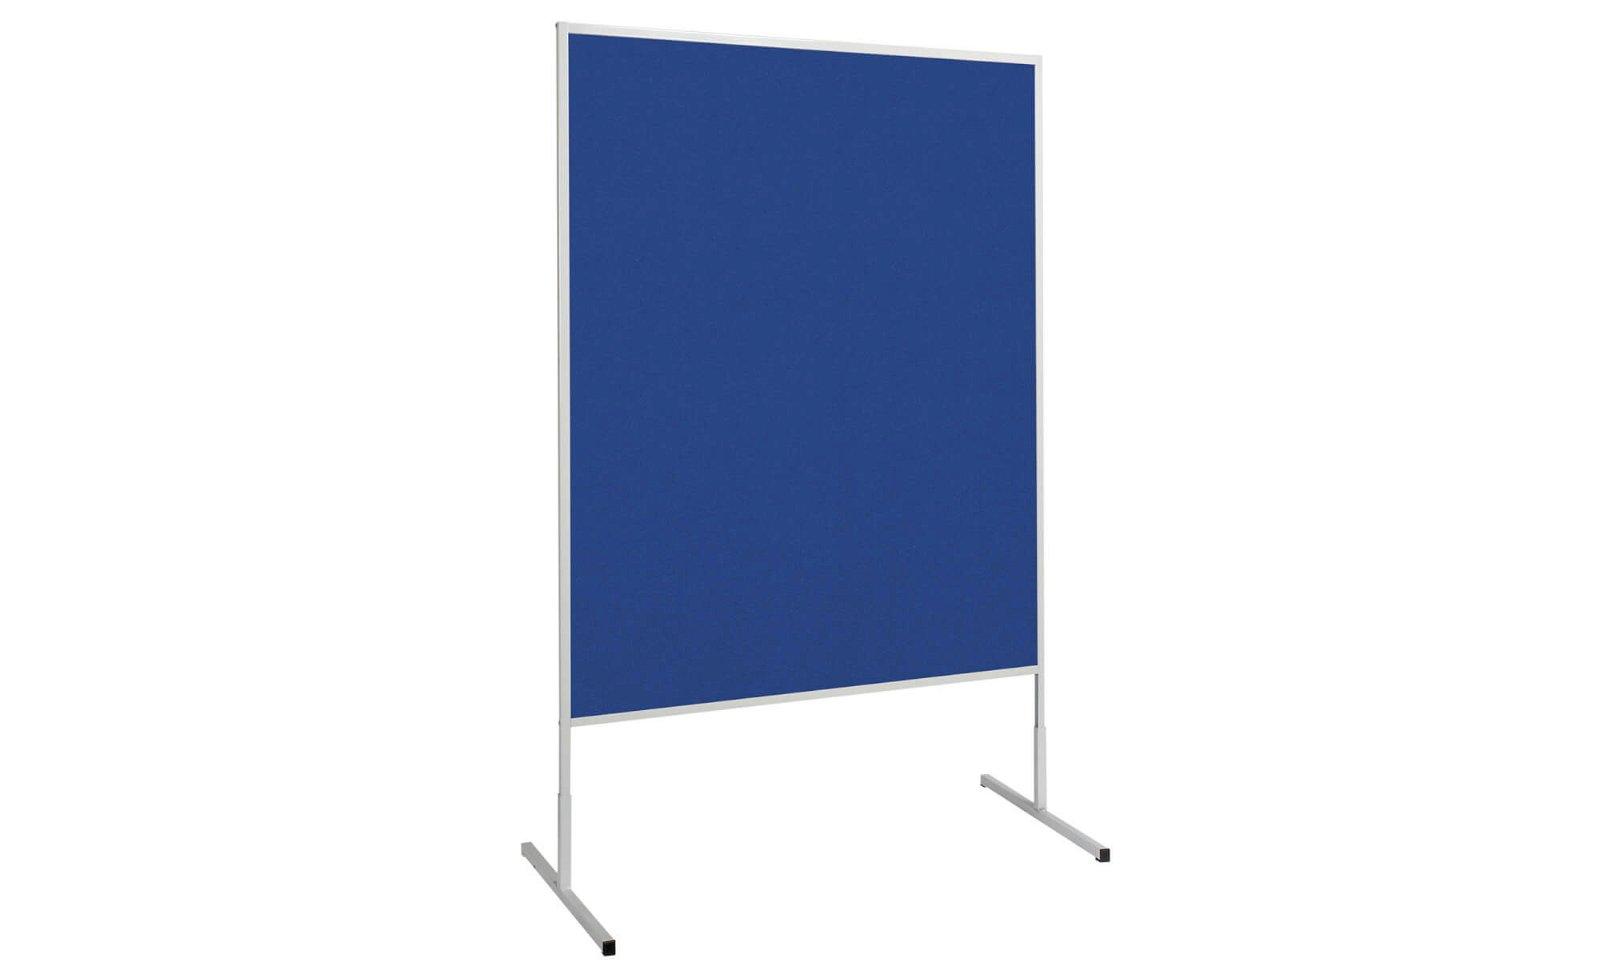 Moderationstafel MAULstandard Filz blau, 150x120 cm, grau